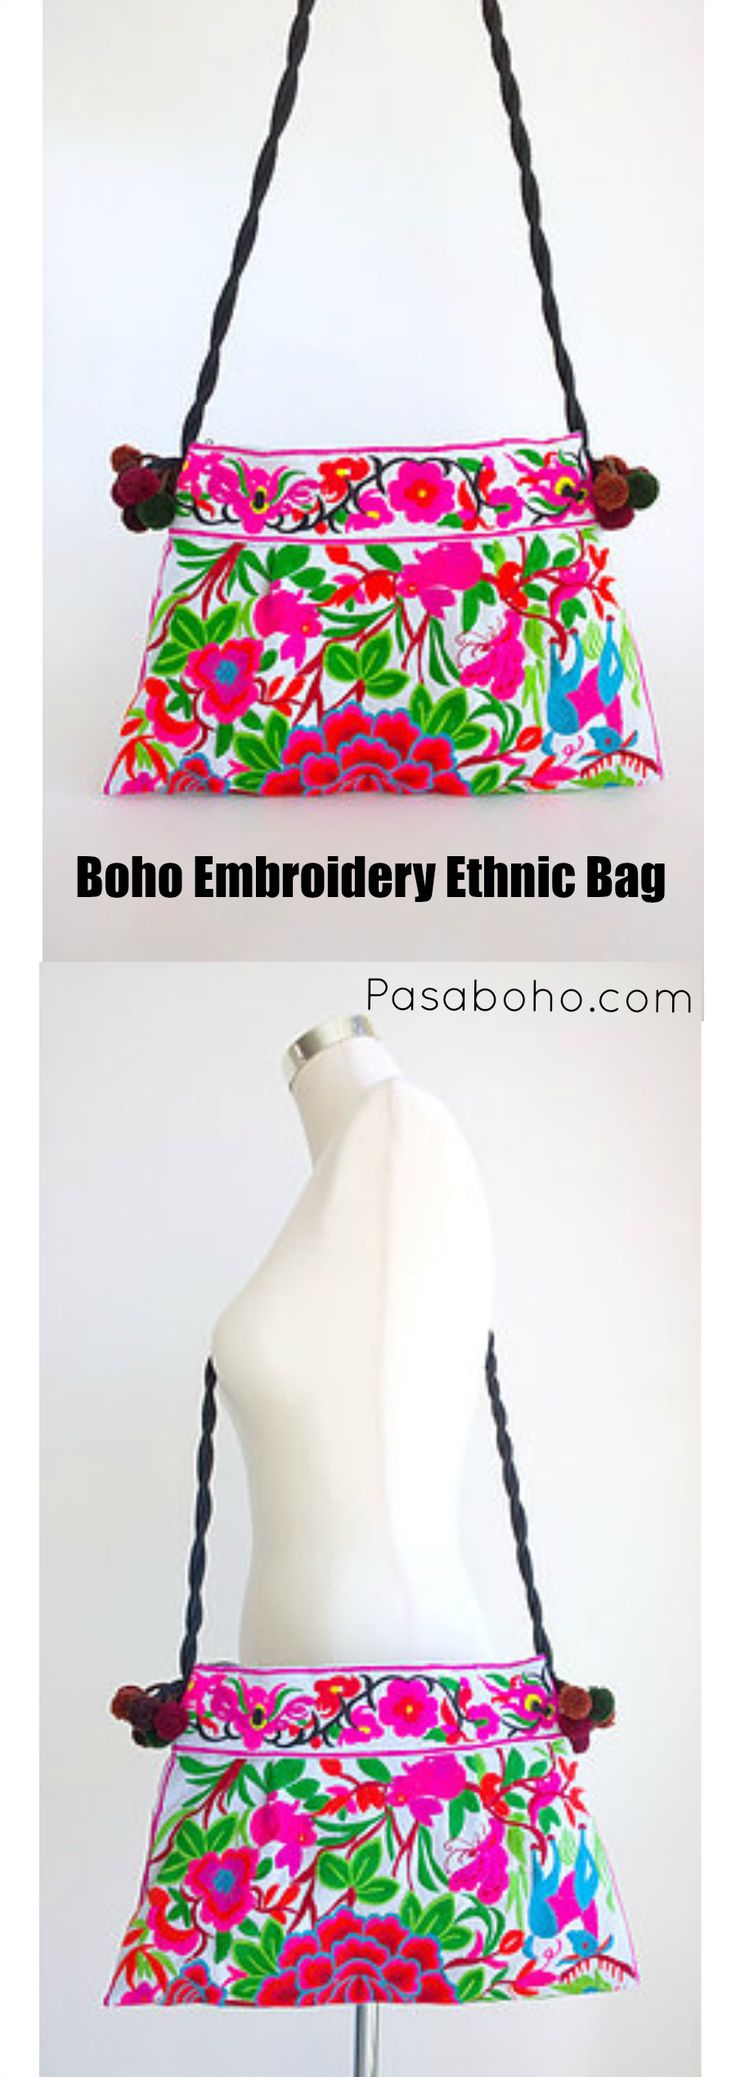 $25 ( Free Shipping Worldwide ) - Boho Embroidery Ethnic Bag from Pasaboho